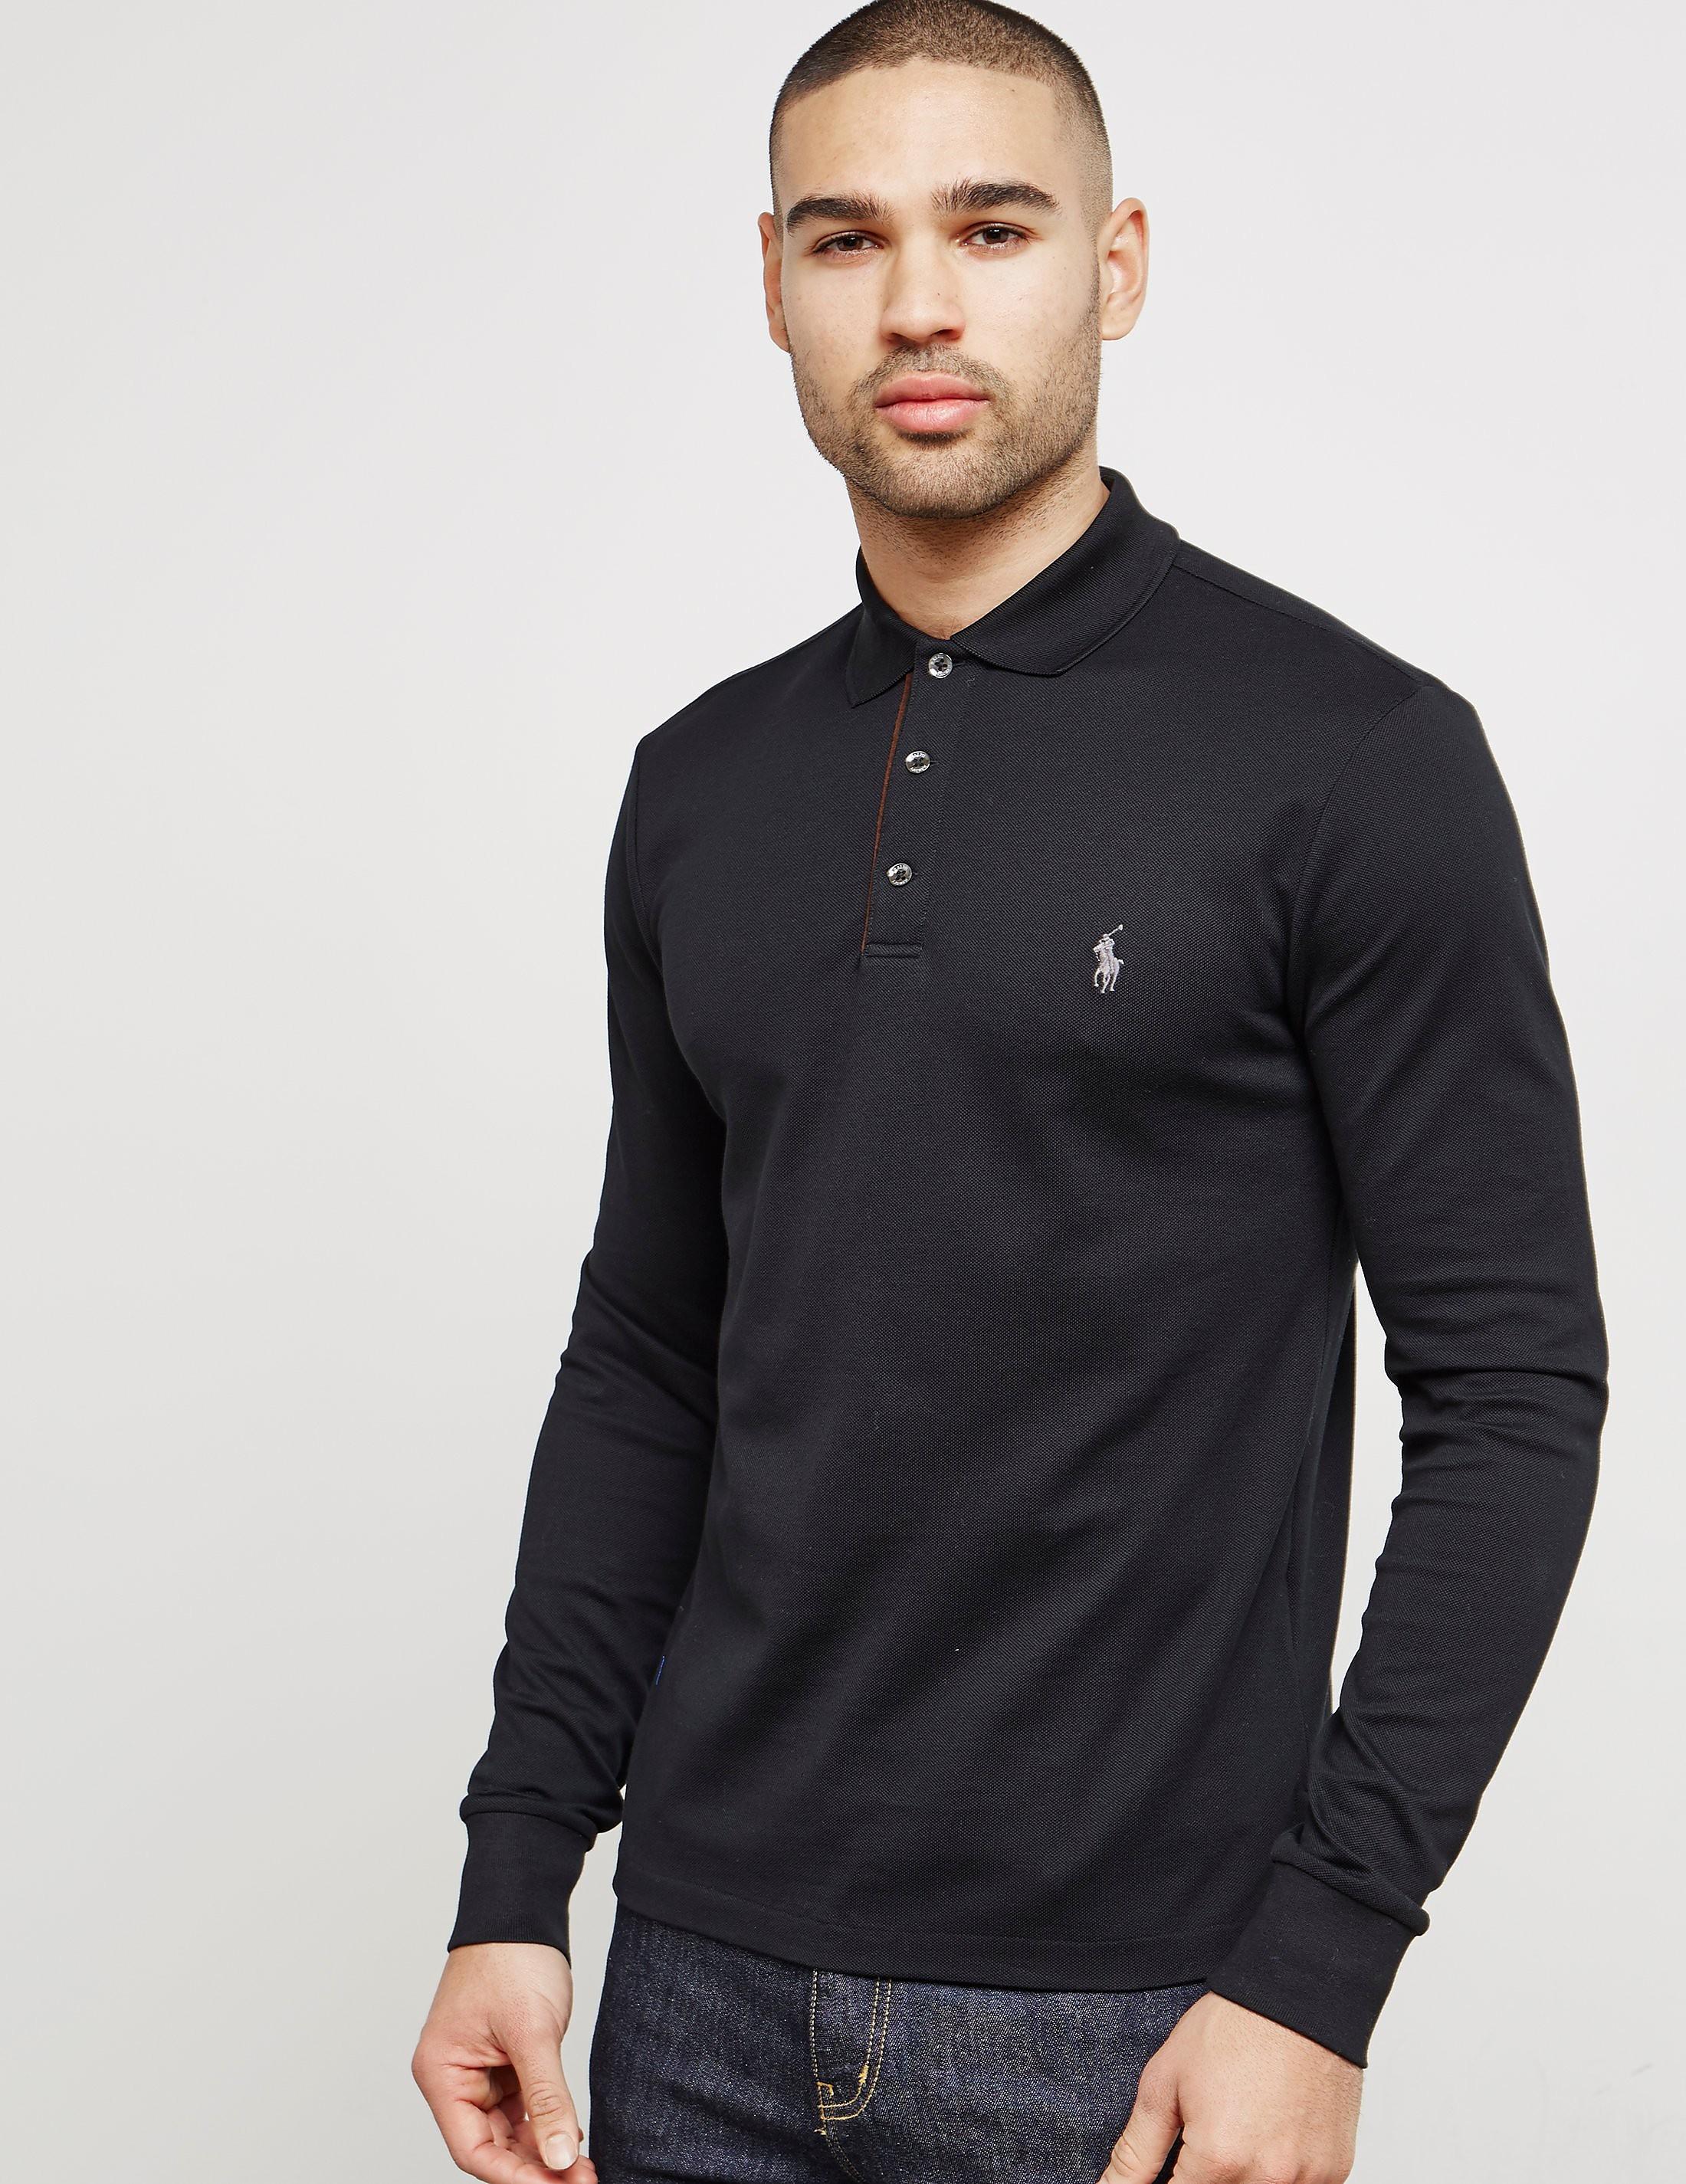 Polo Ralph Lauren Mesh Long Sleeve Polo Shirt - Online Exclusive